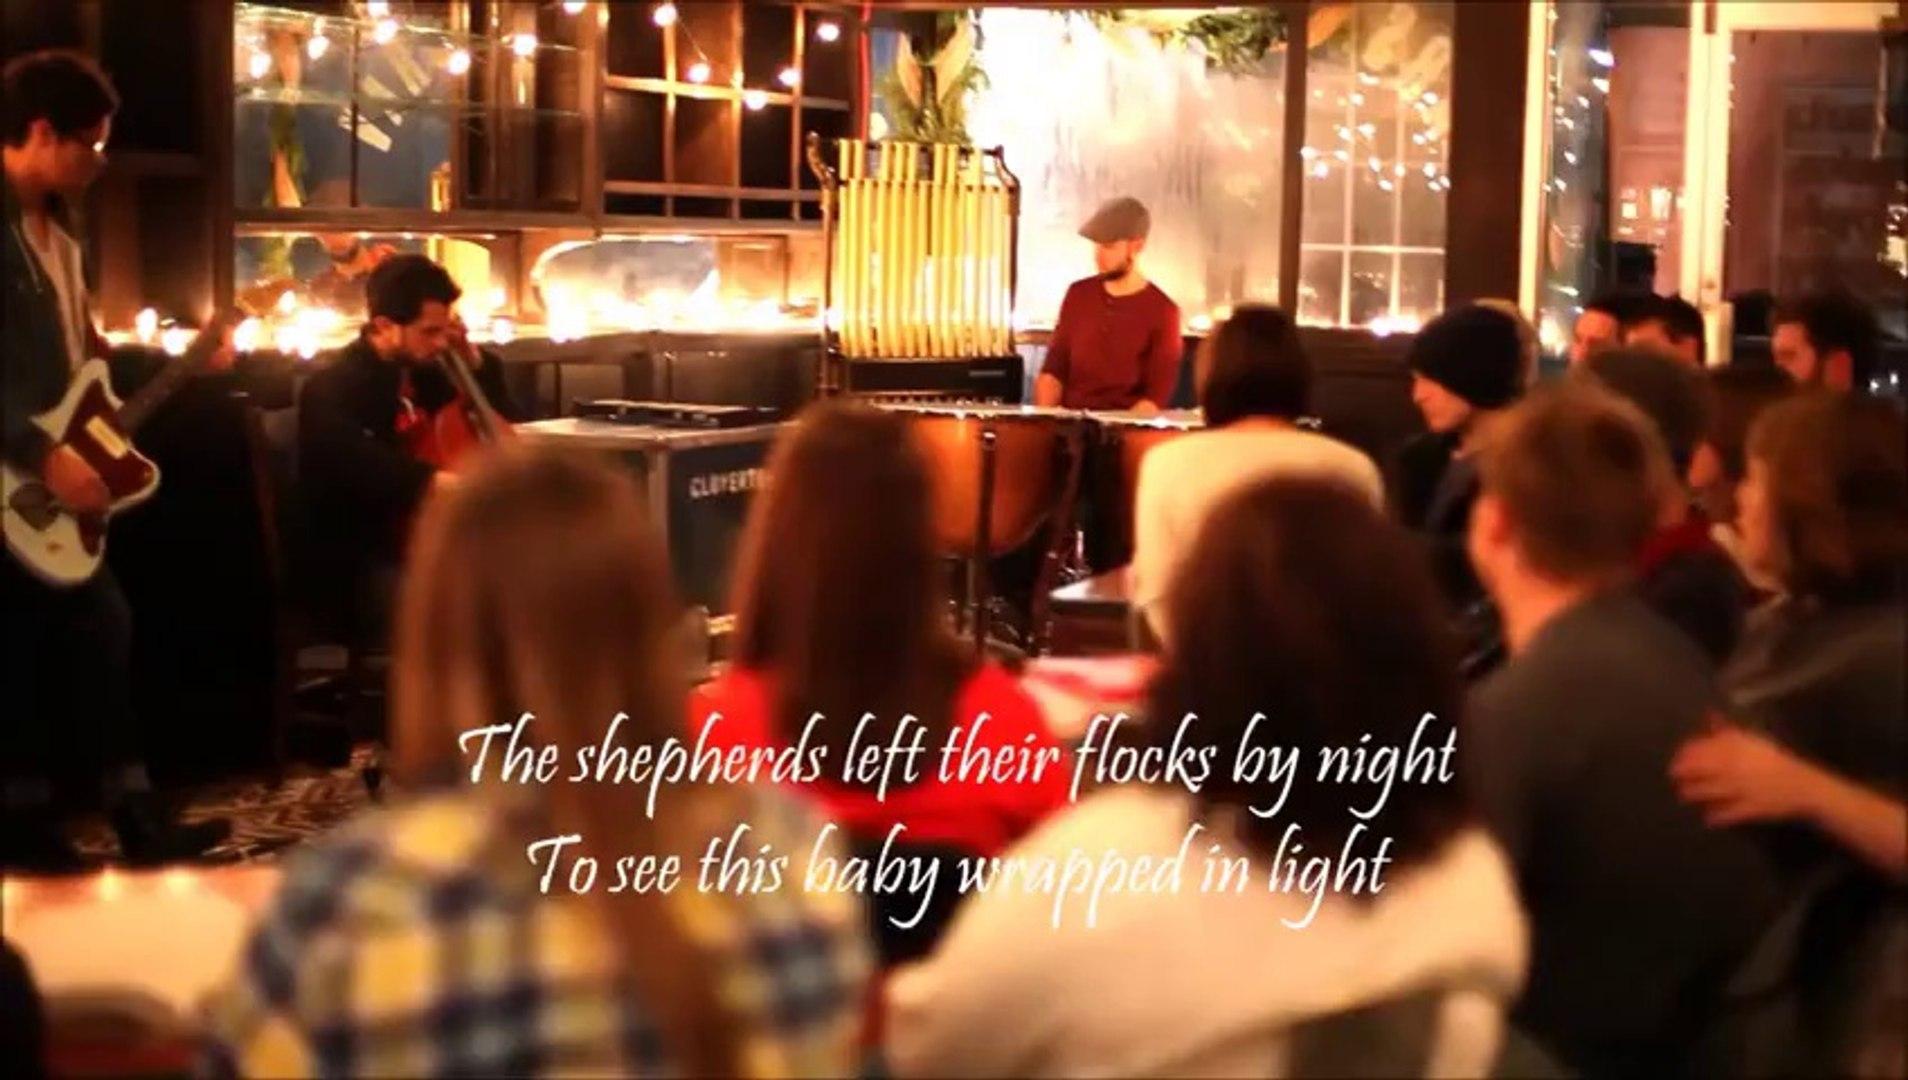 Hallelujah Christmas Lyrics.A Hallelujah Christmas Cloverton Music Video With Lyrics